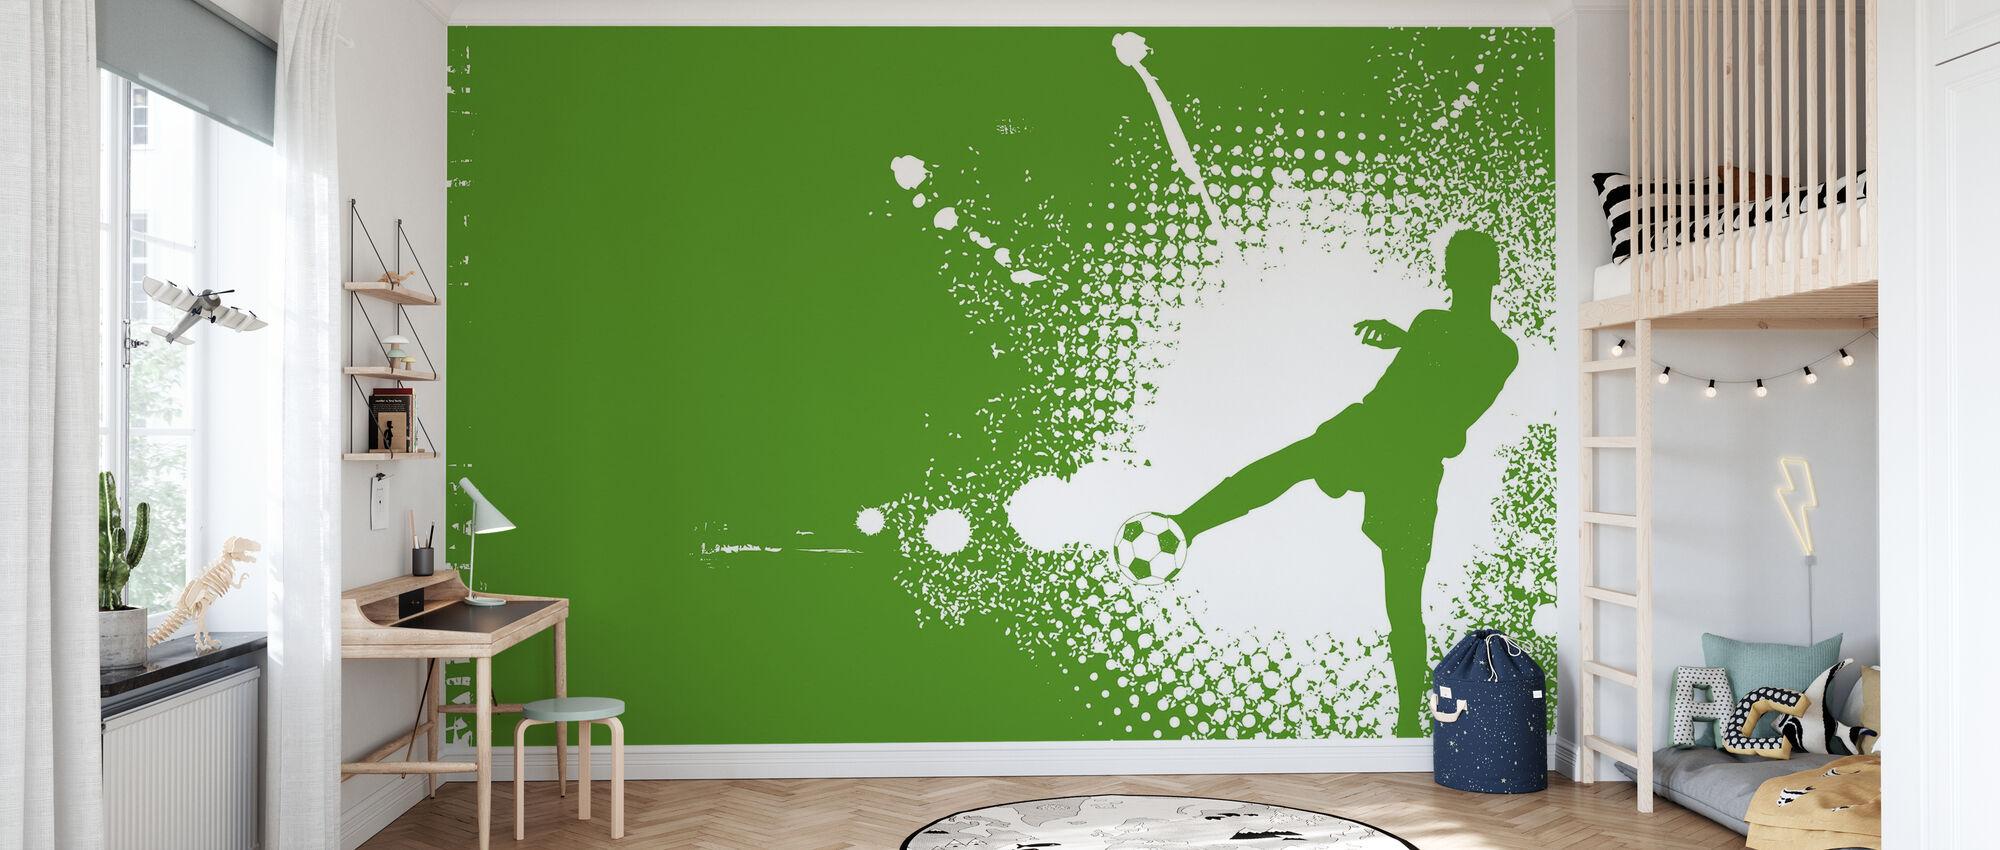 Voetbalspeler Groen - Behang - Kinderkamer